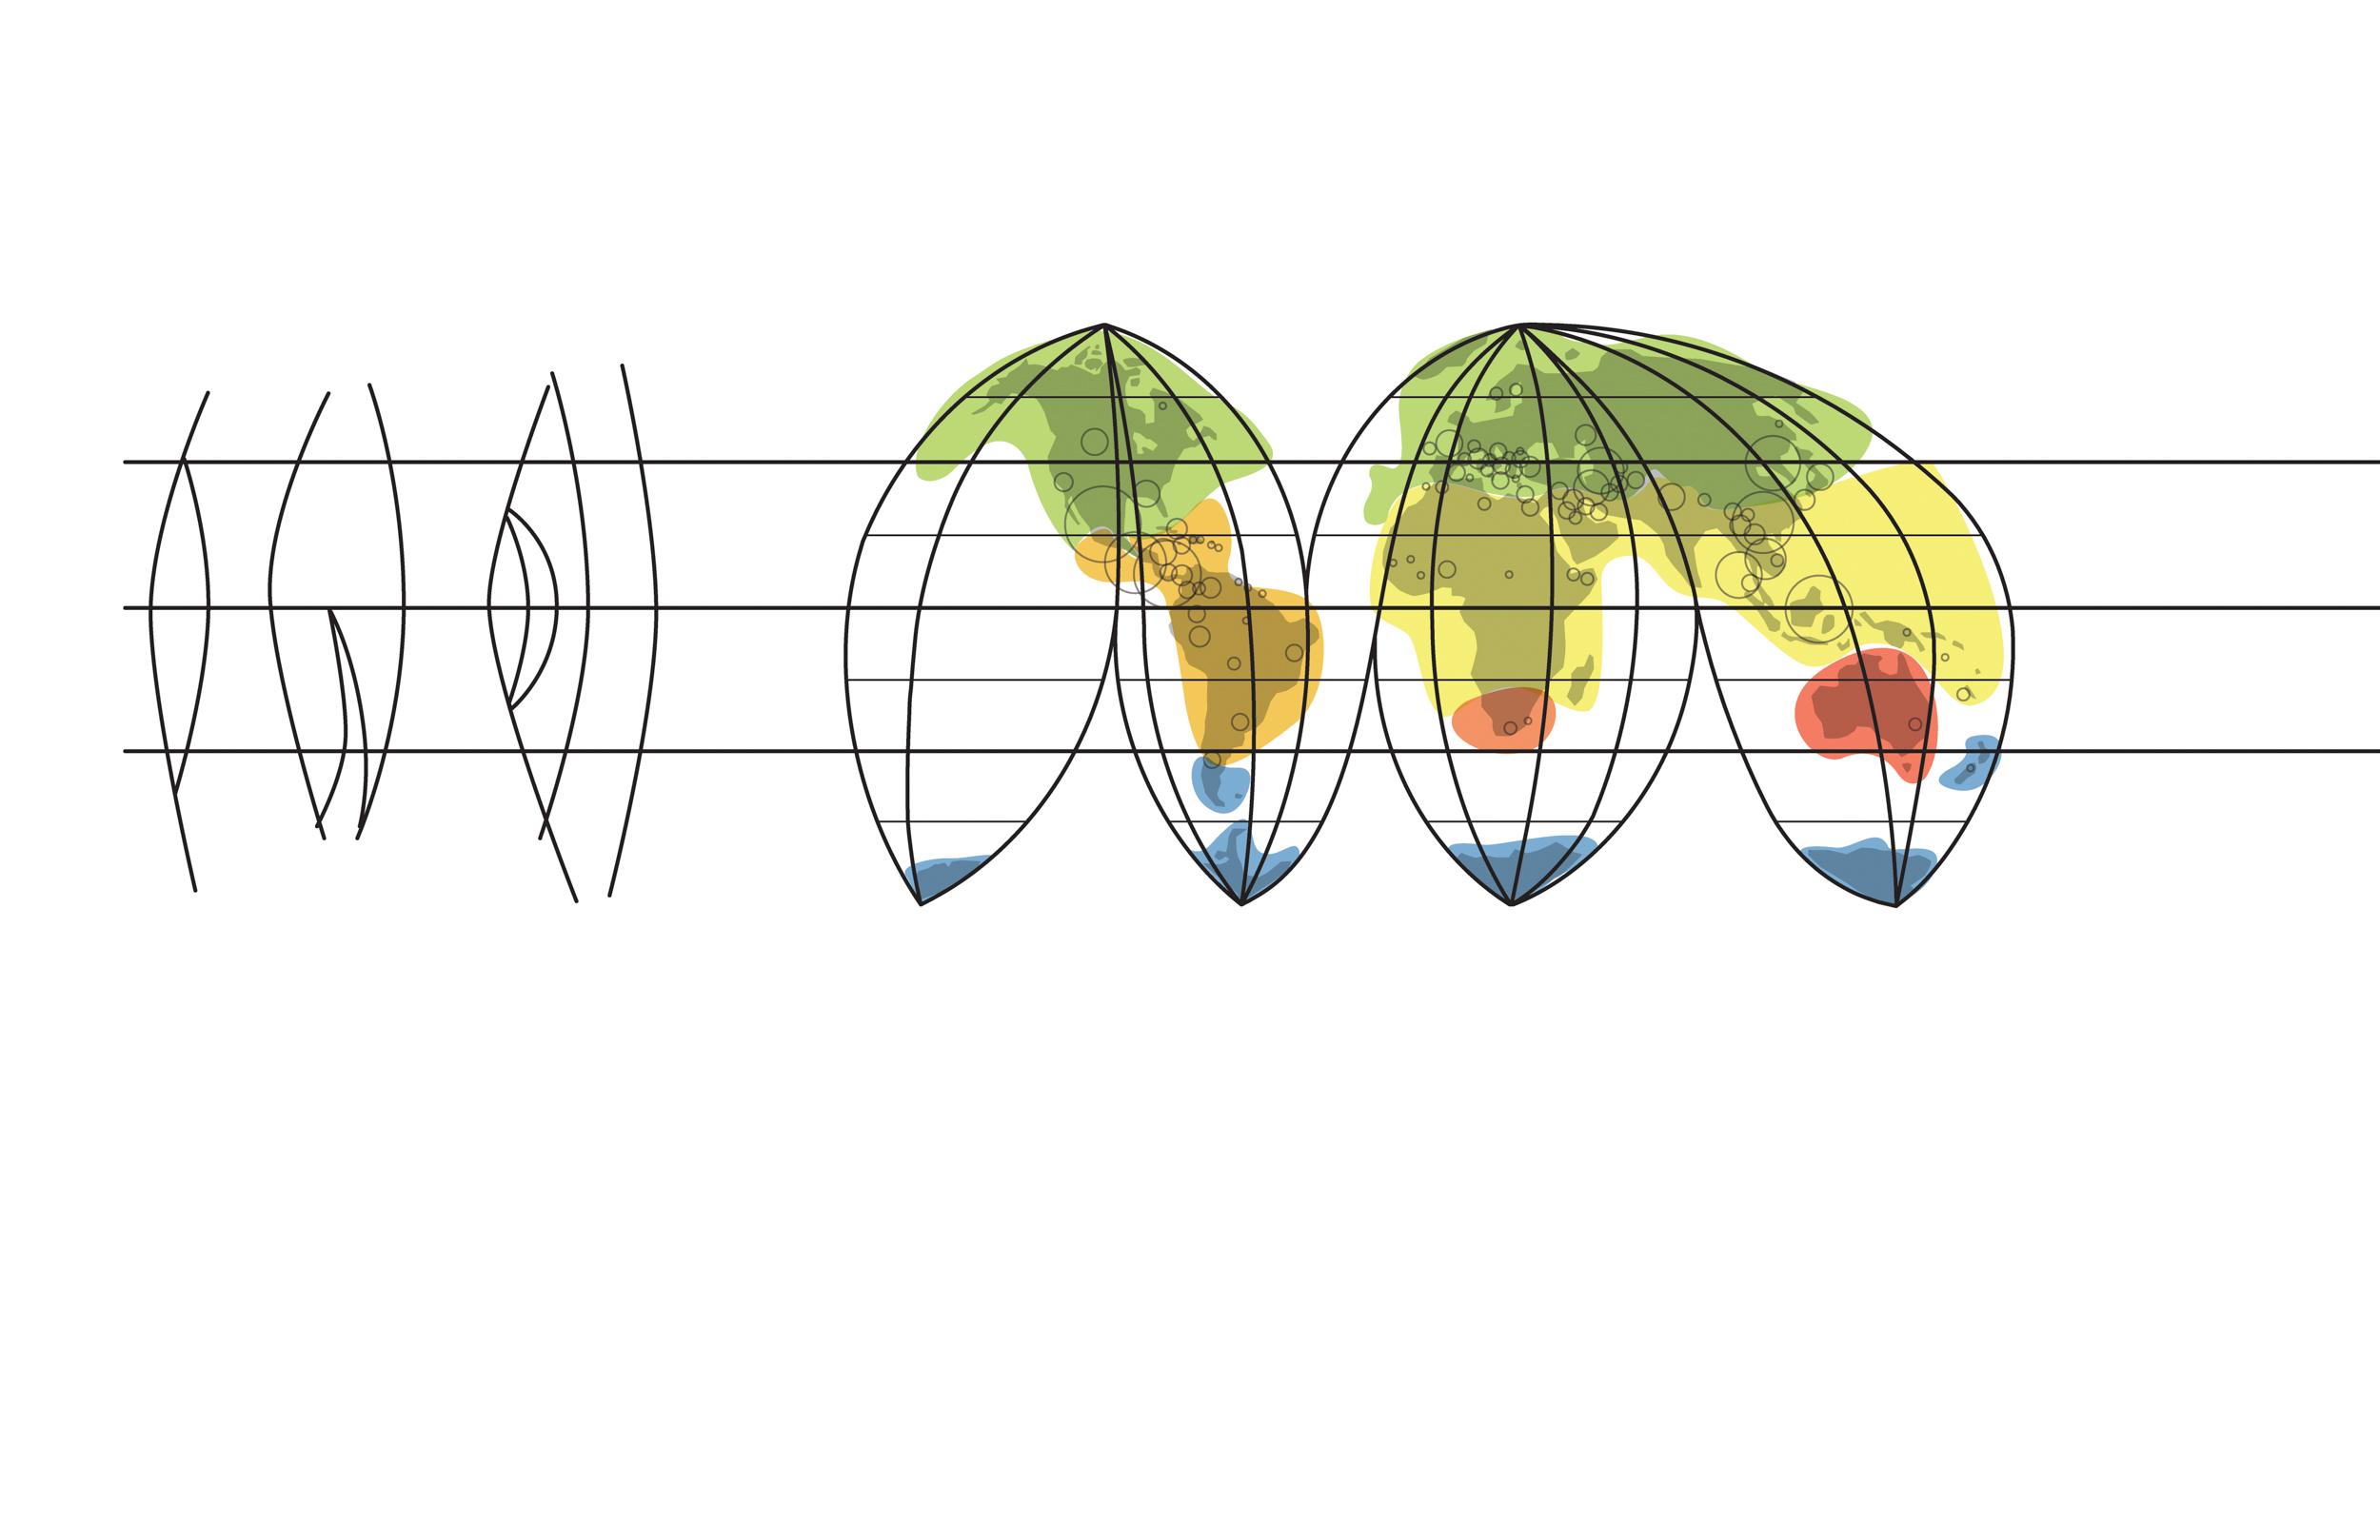 Goode's homolosine projection